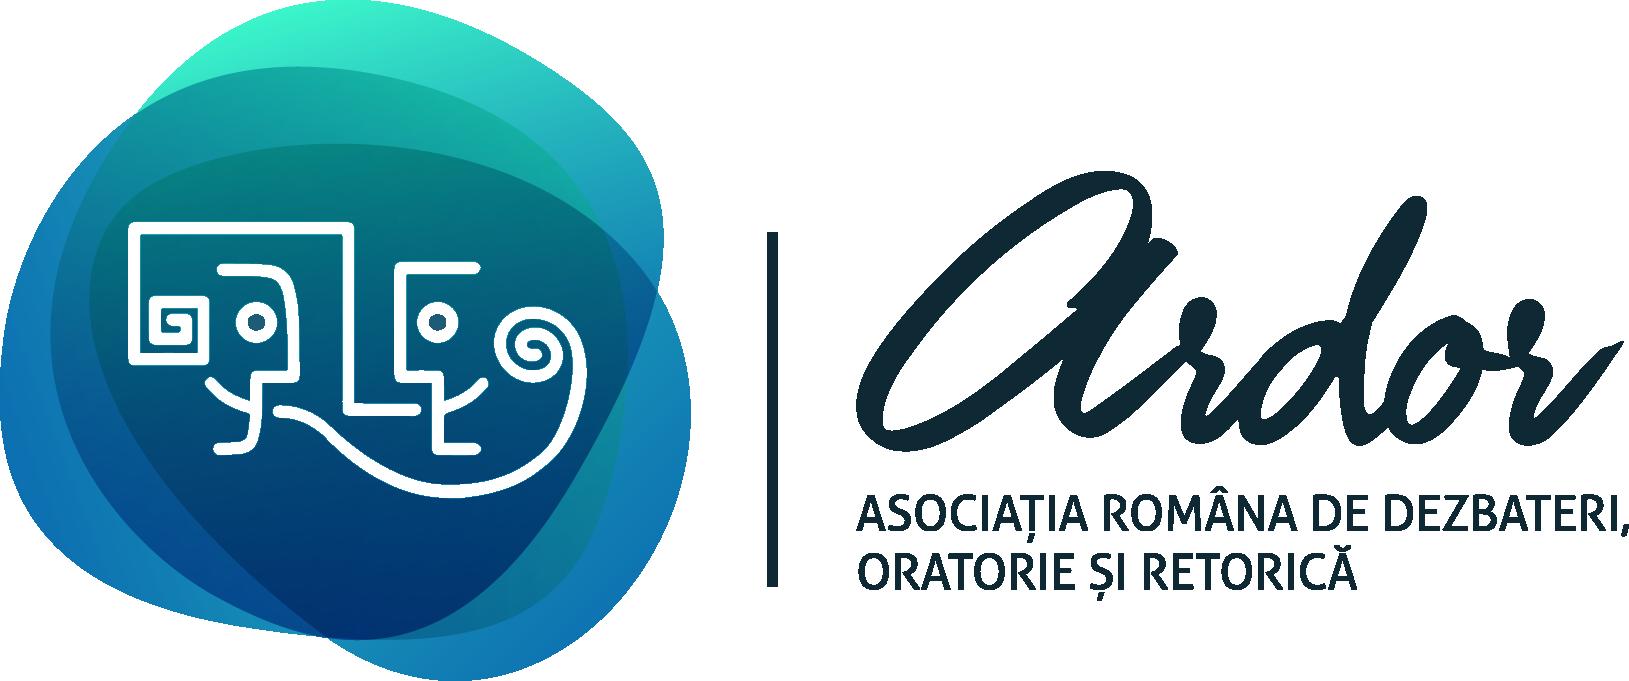 Asociatia Romana de Dezbateri, Oratorie si Retorica (ARDOR) logo